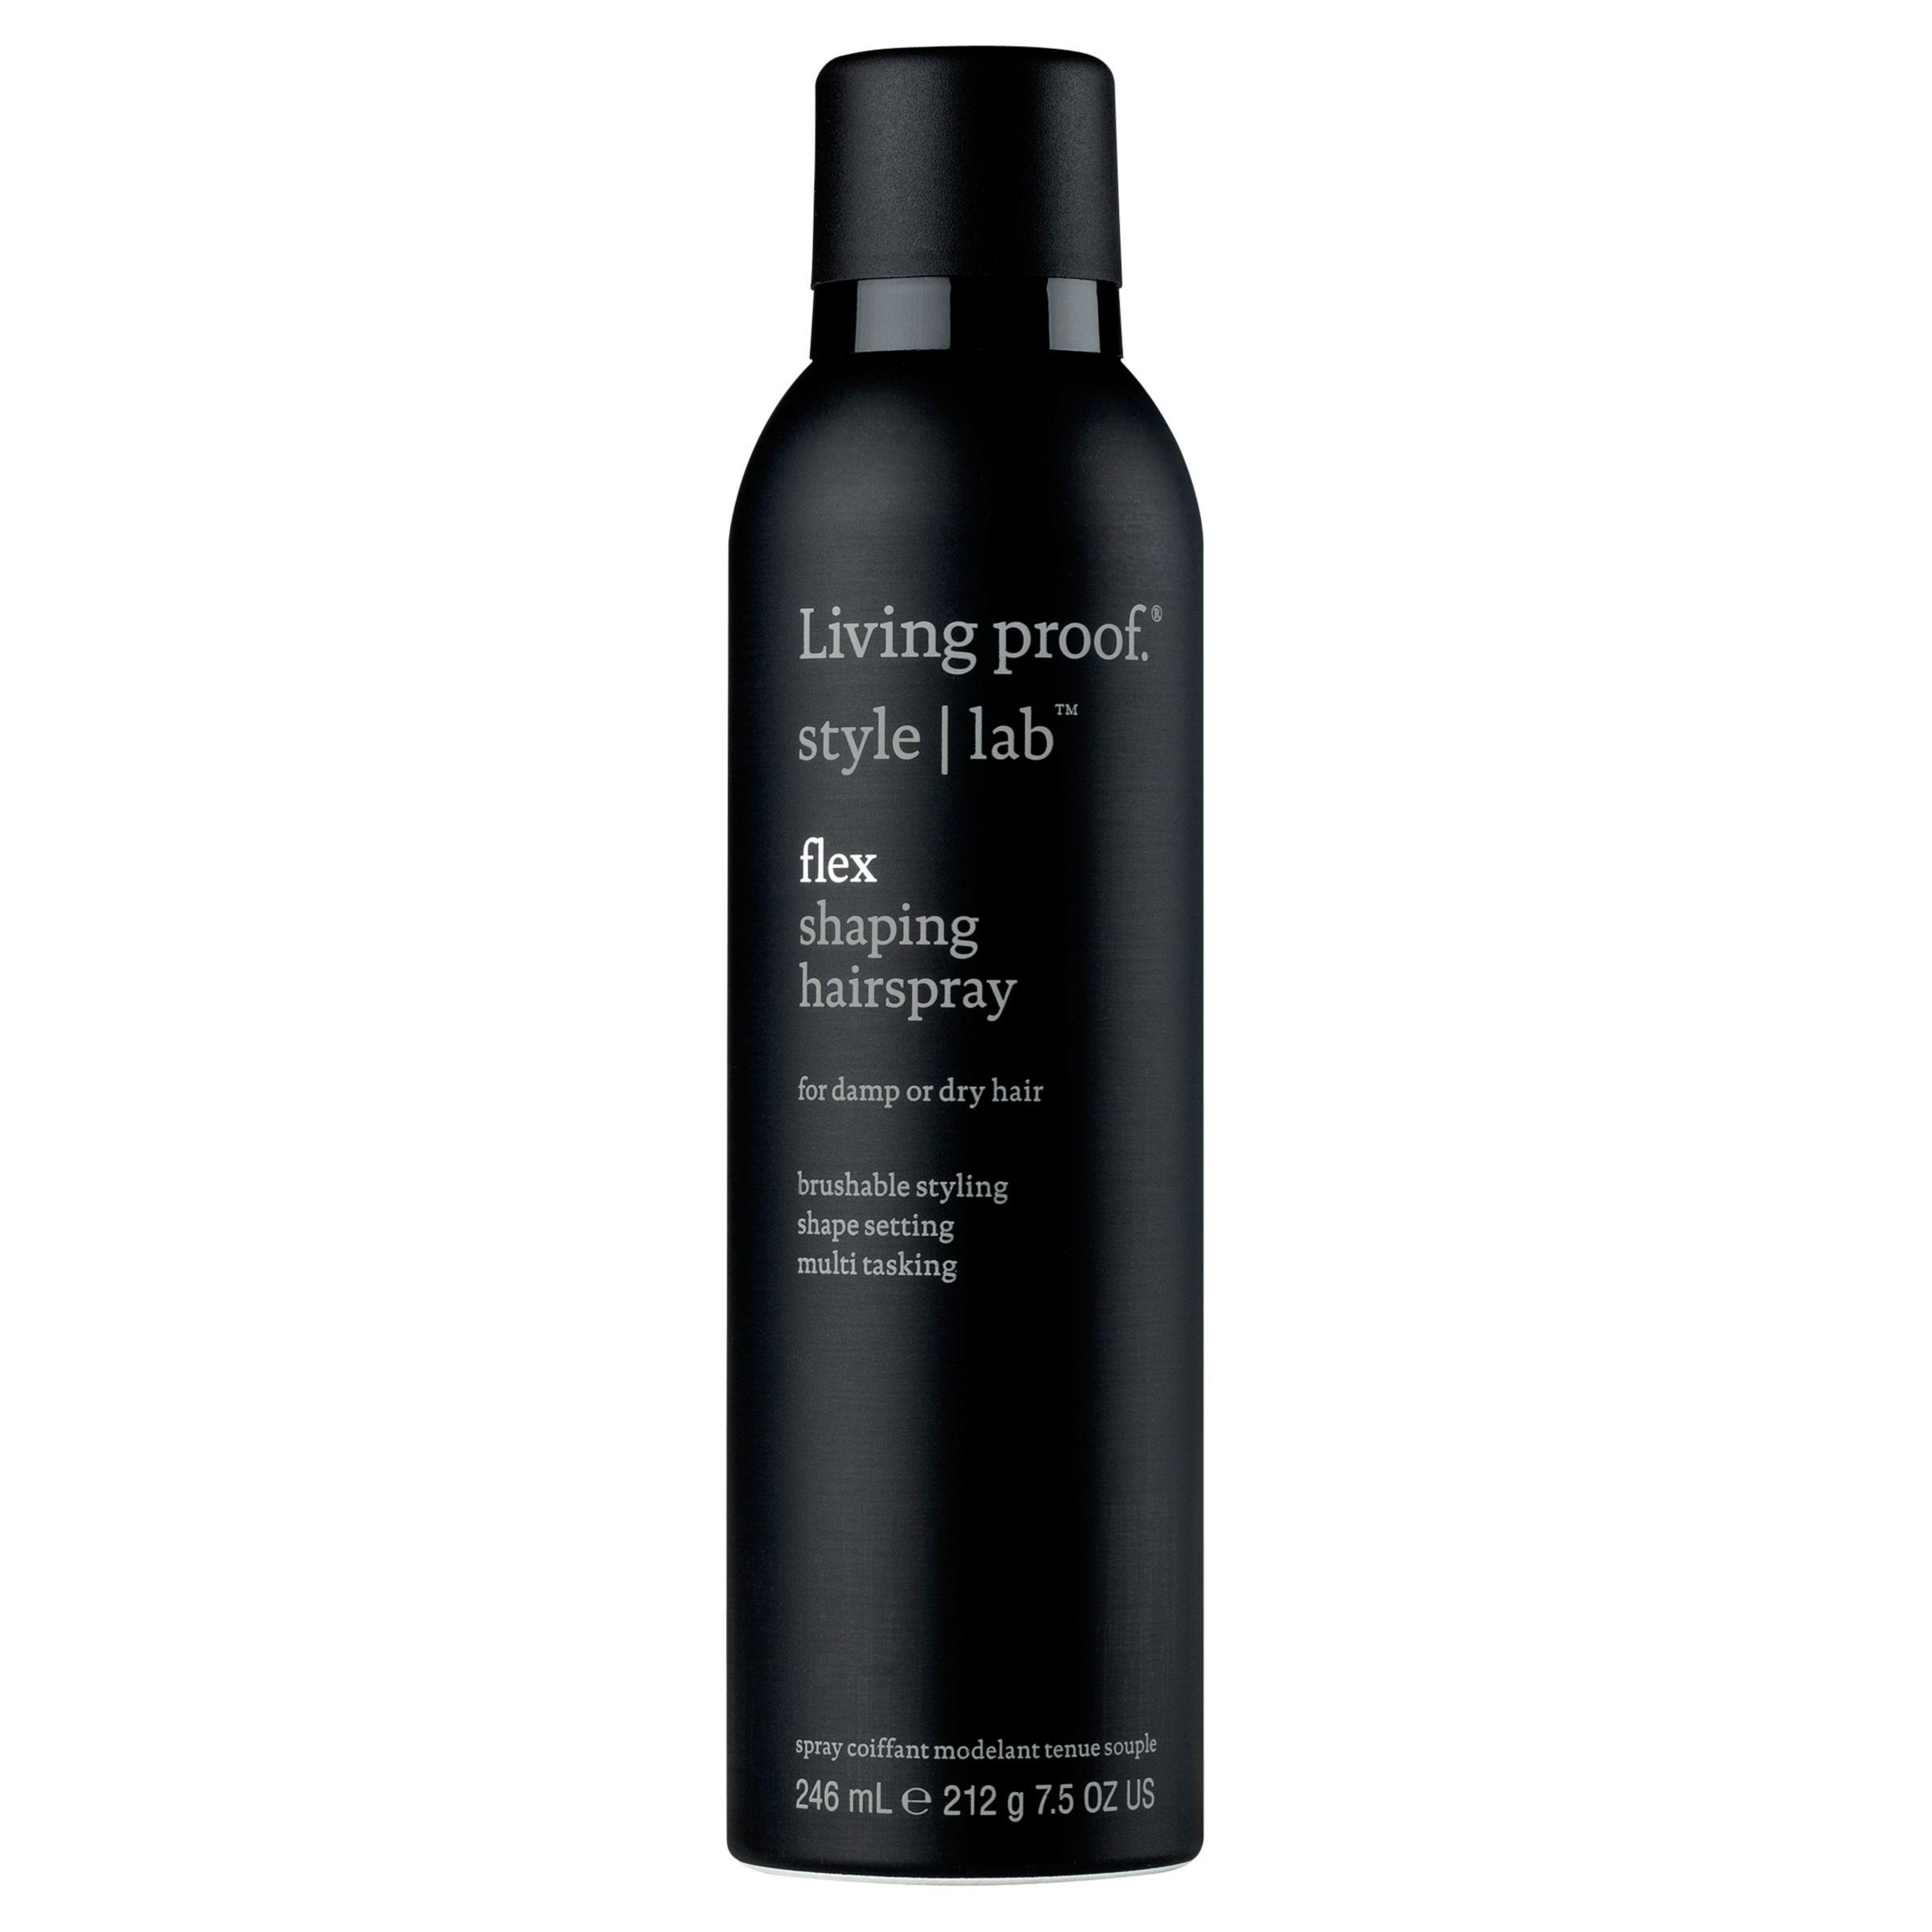 Living Proof Living Proof Flex Shaping Hairspray, 246ml